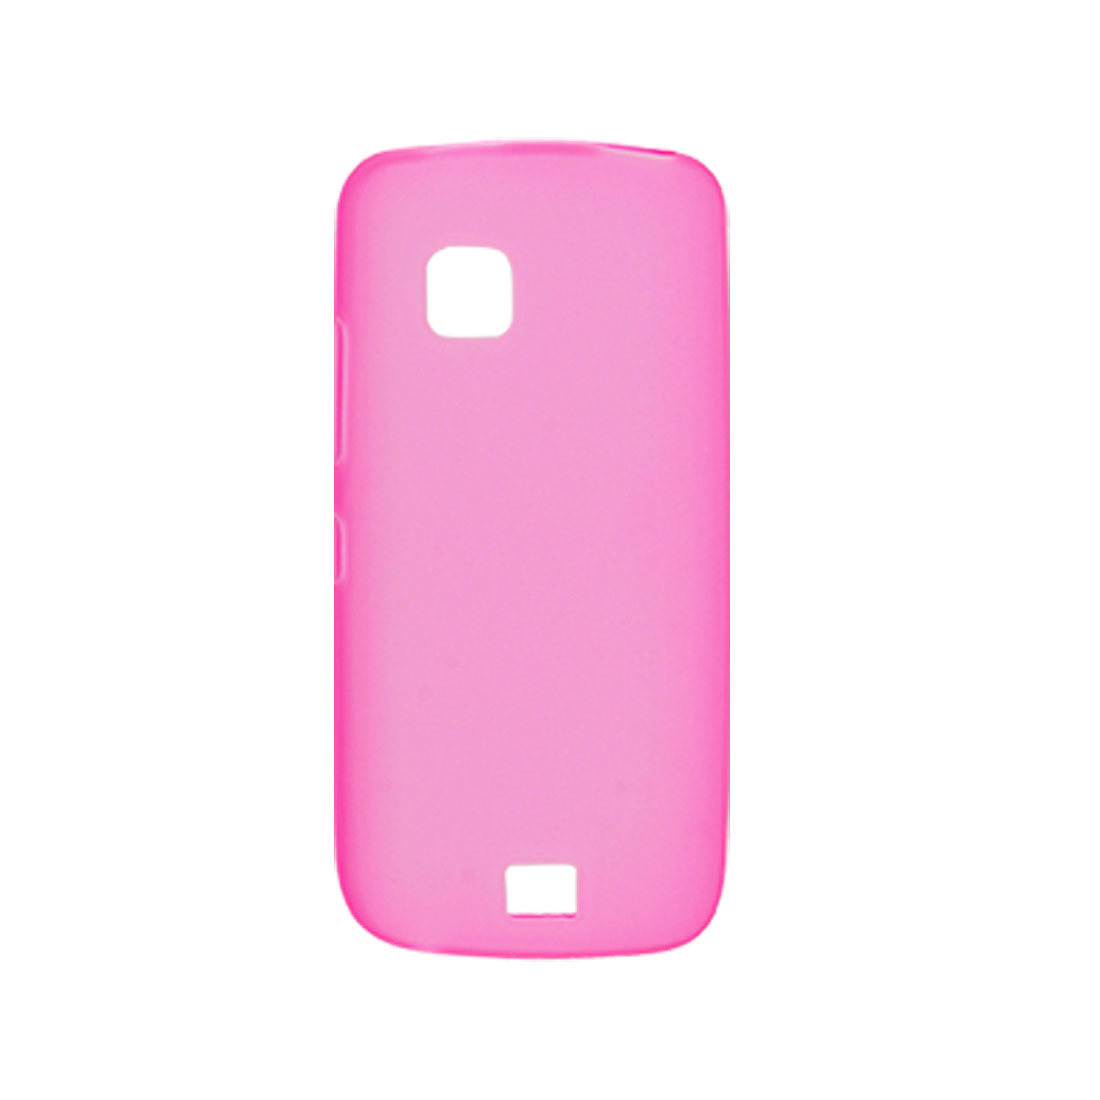 Amaranth Pink Soft Plastic Case Protector for Nokia C5-03